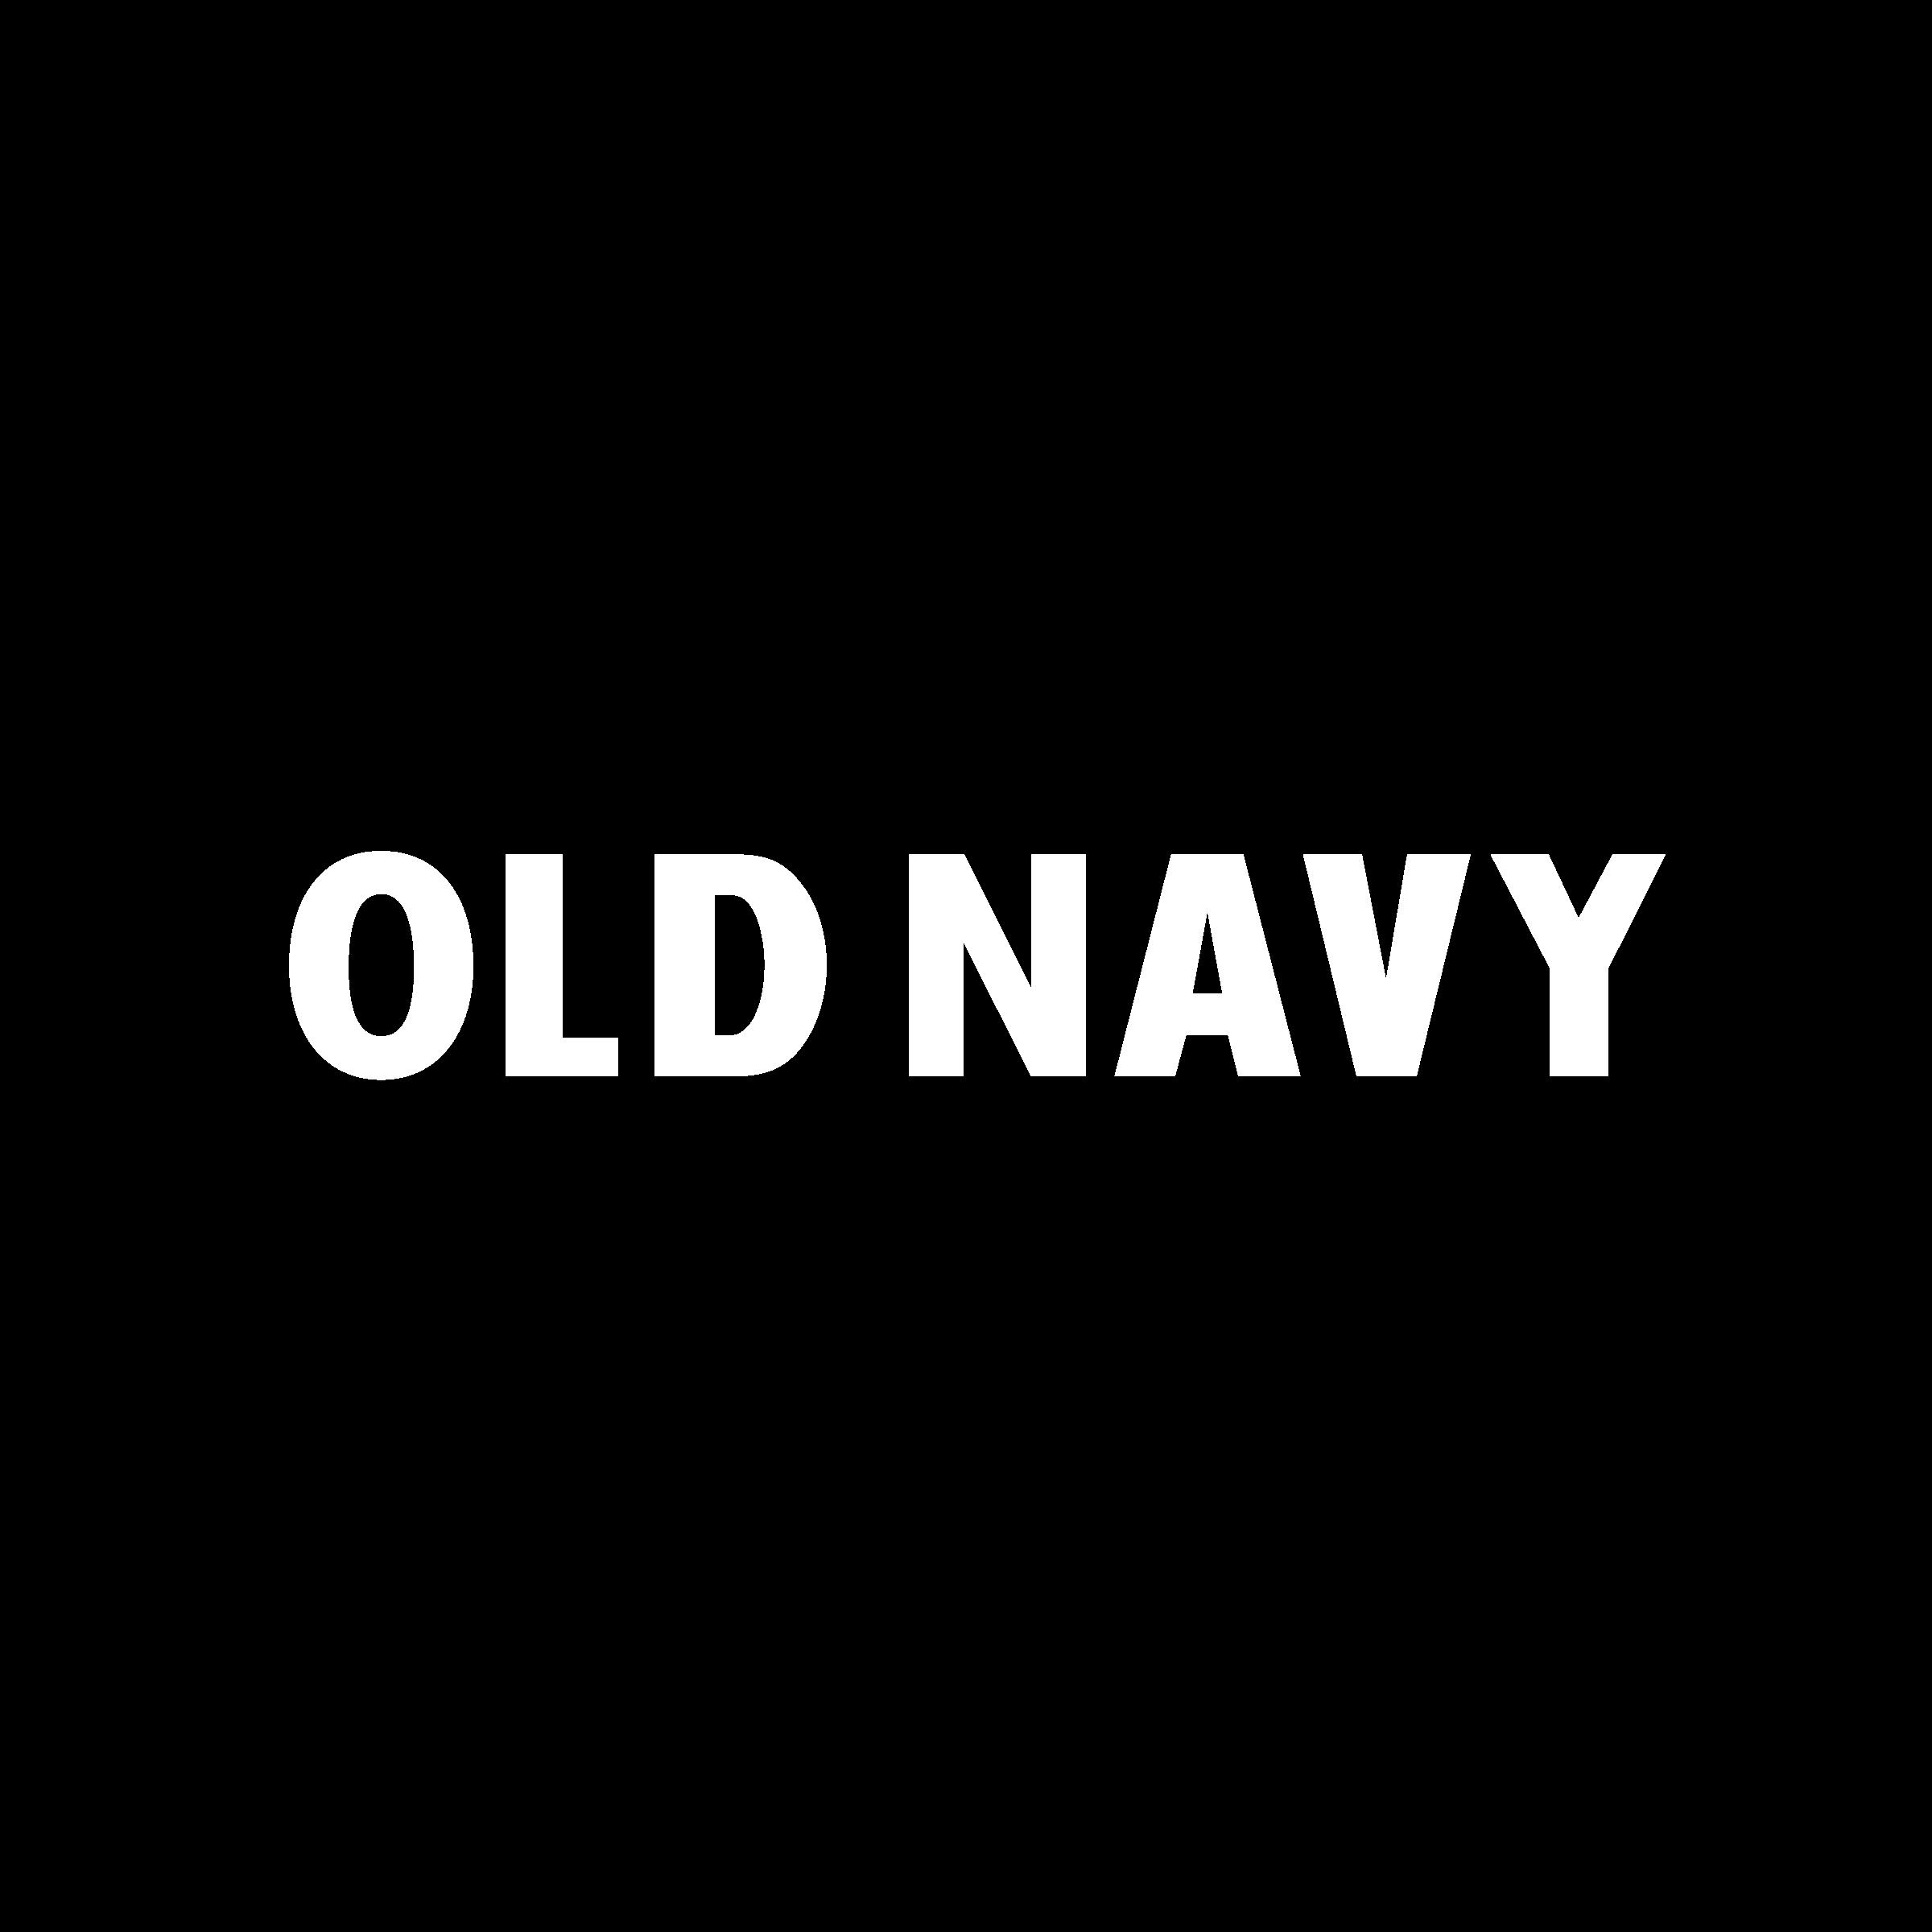 Old Navy Logo PNG Transparent & SVG Vector - Freebie Supply